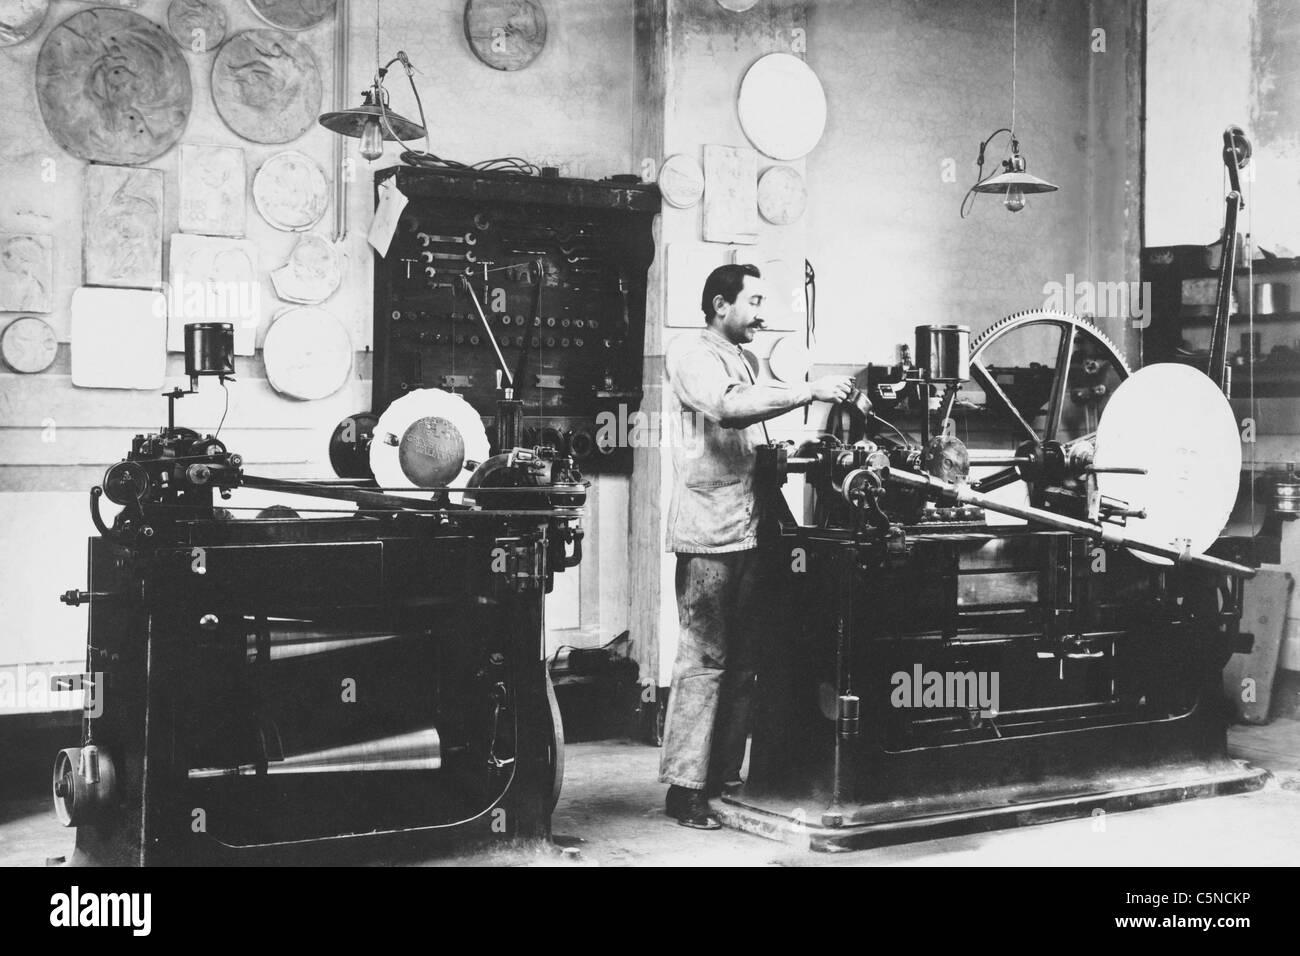 italy, rome, money press, 1900 - Stock Image